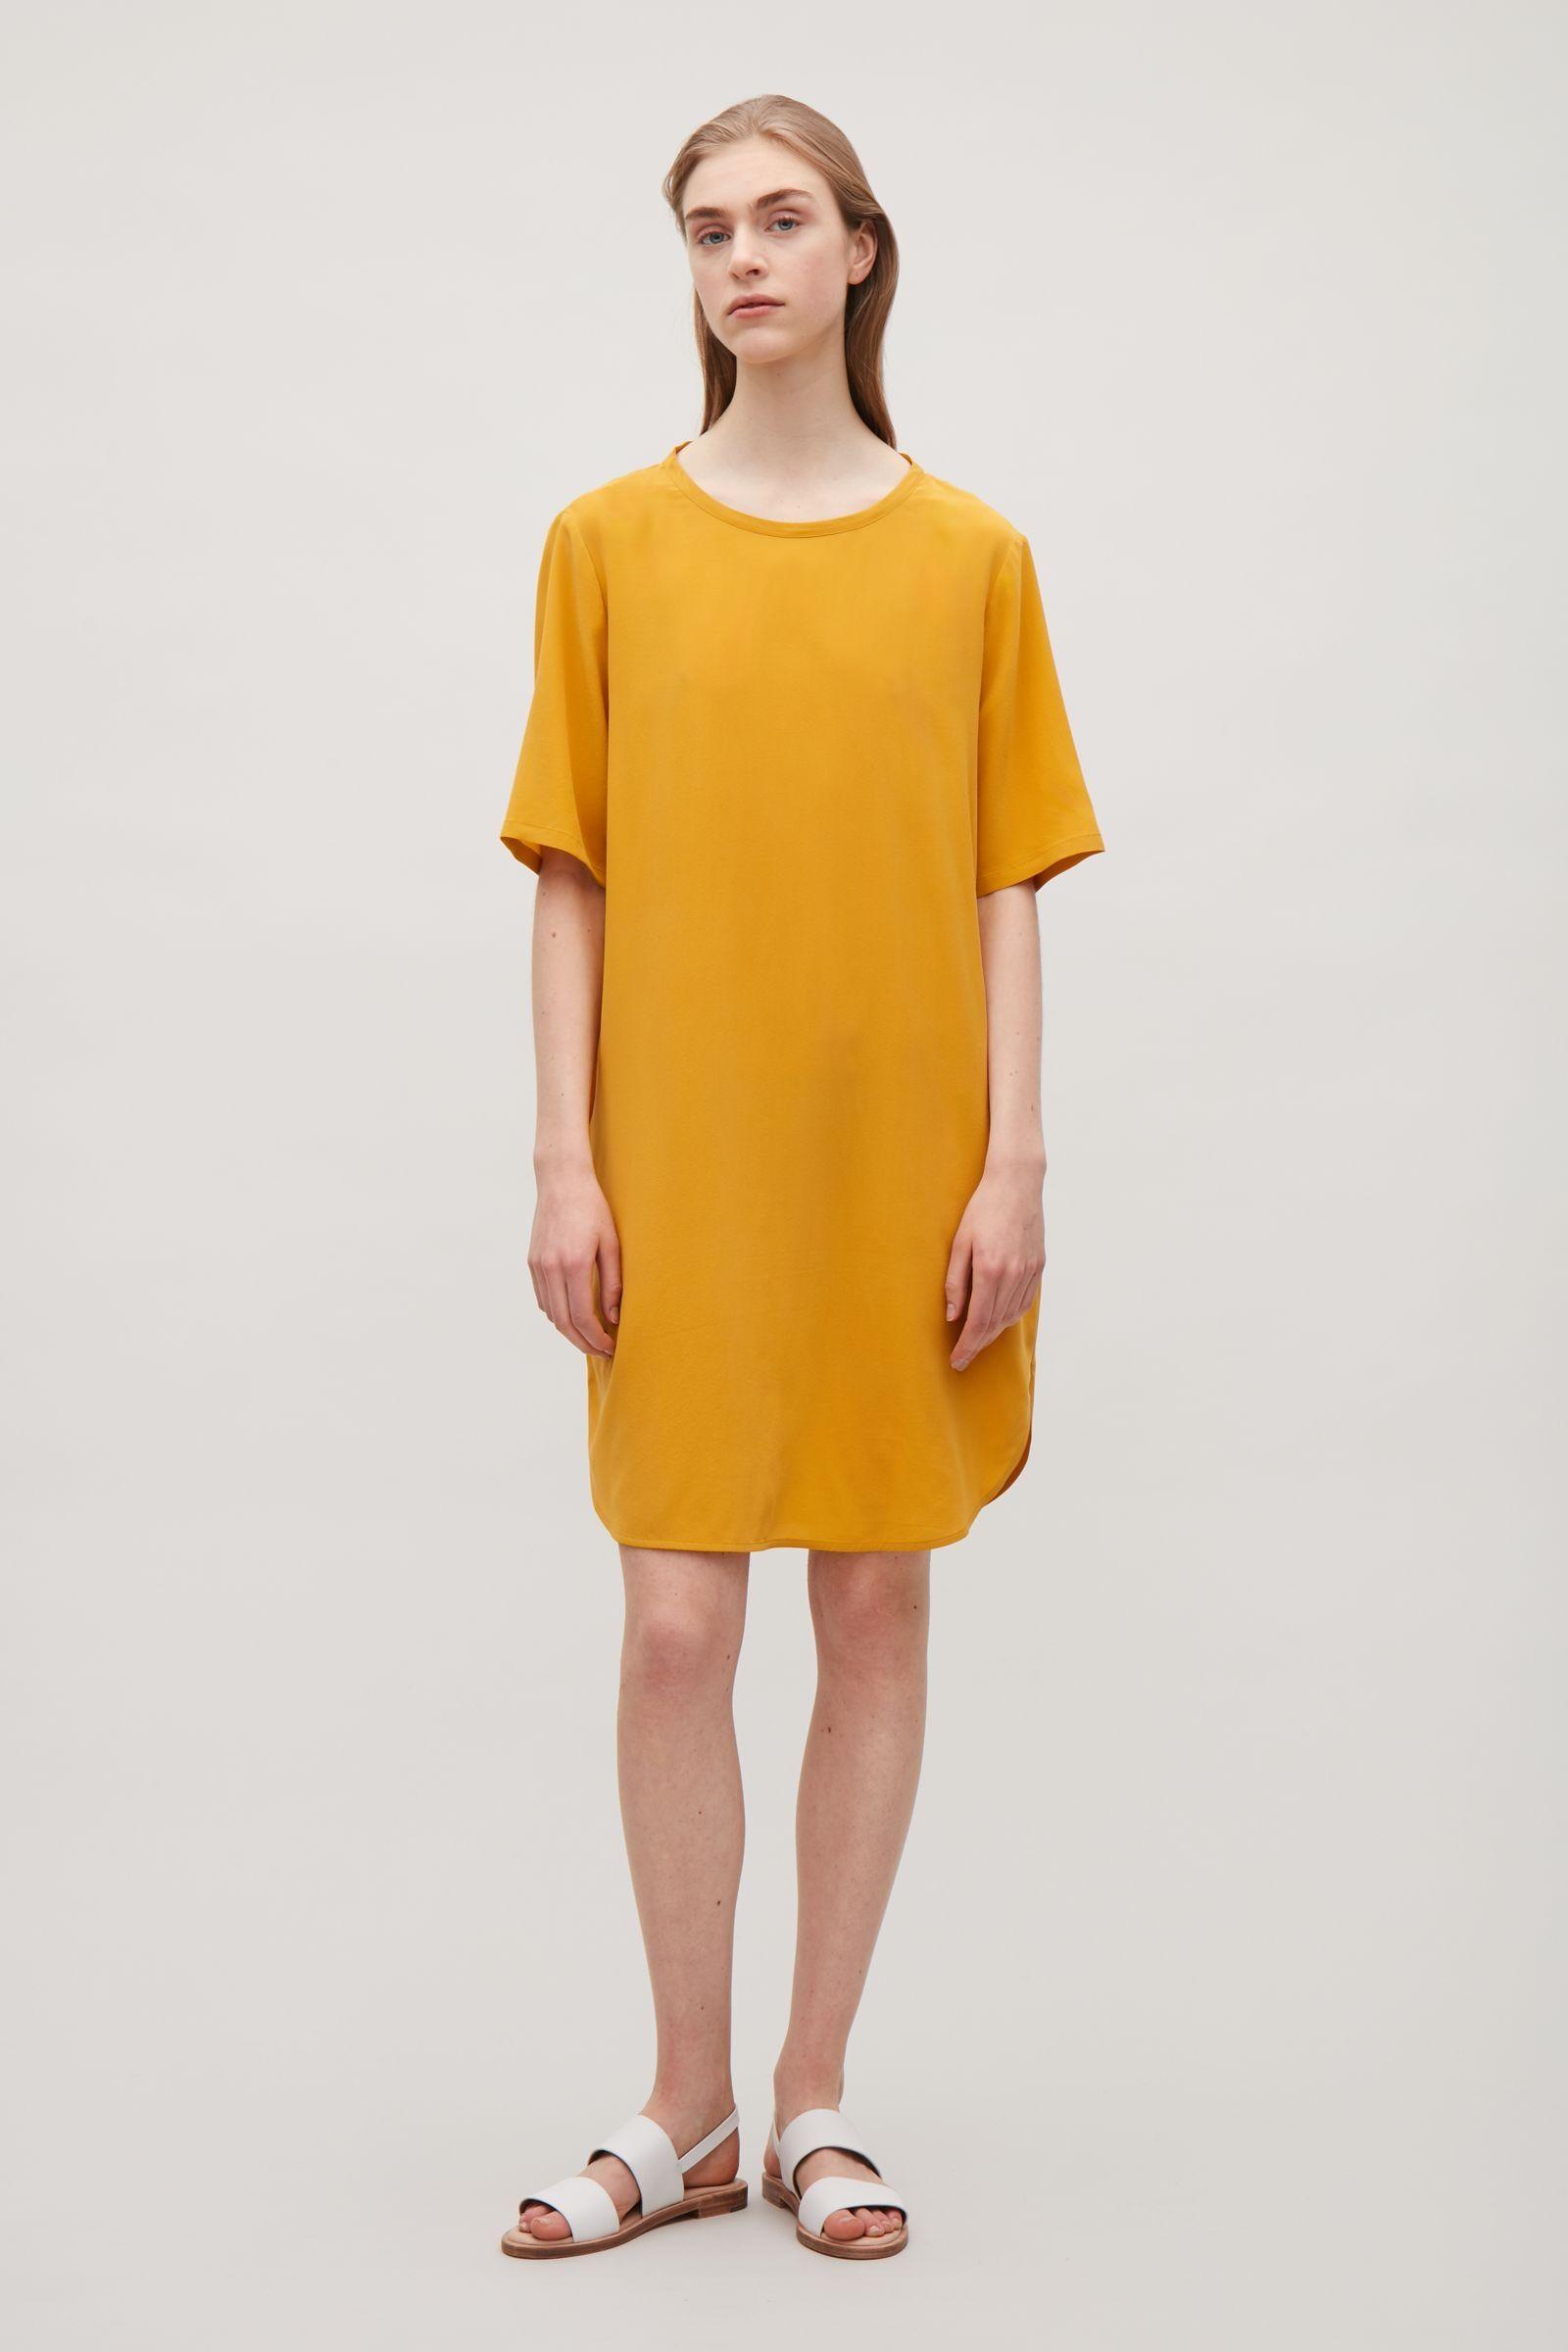 Cos Image 6 Of Oversized Silk T Shirt Dress In Yellow Dress Sacks